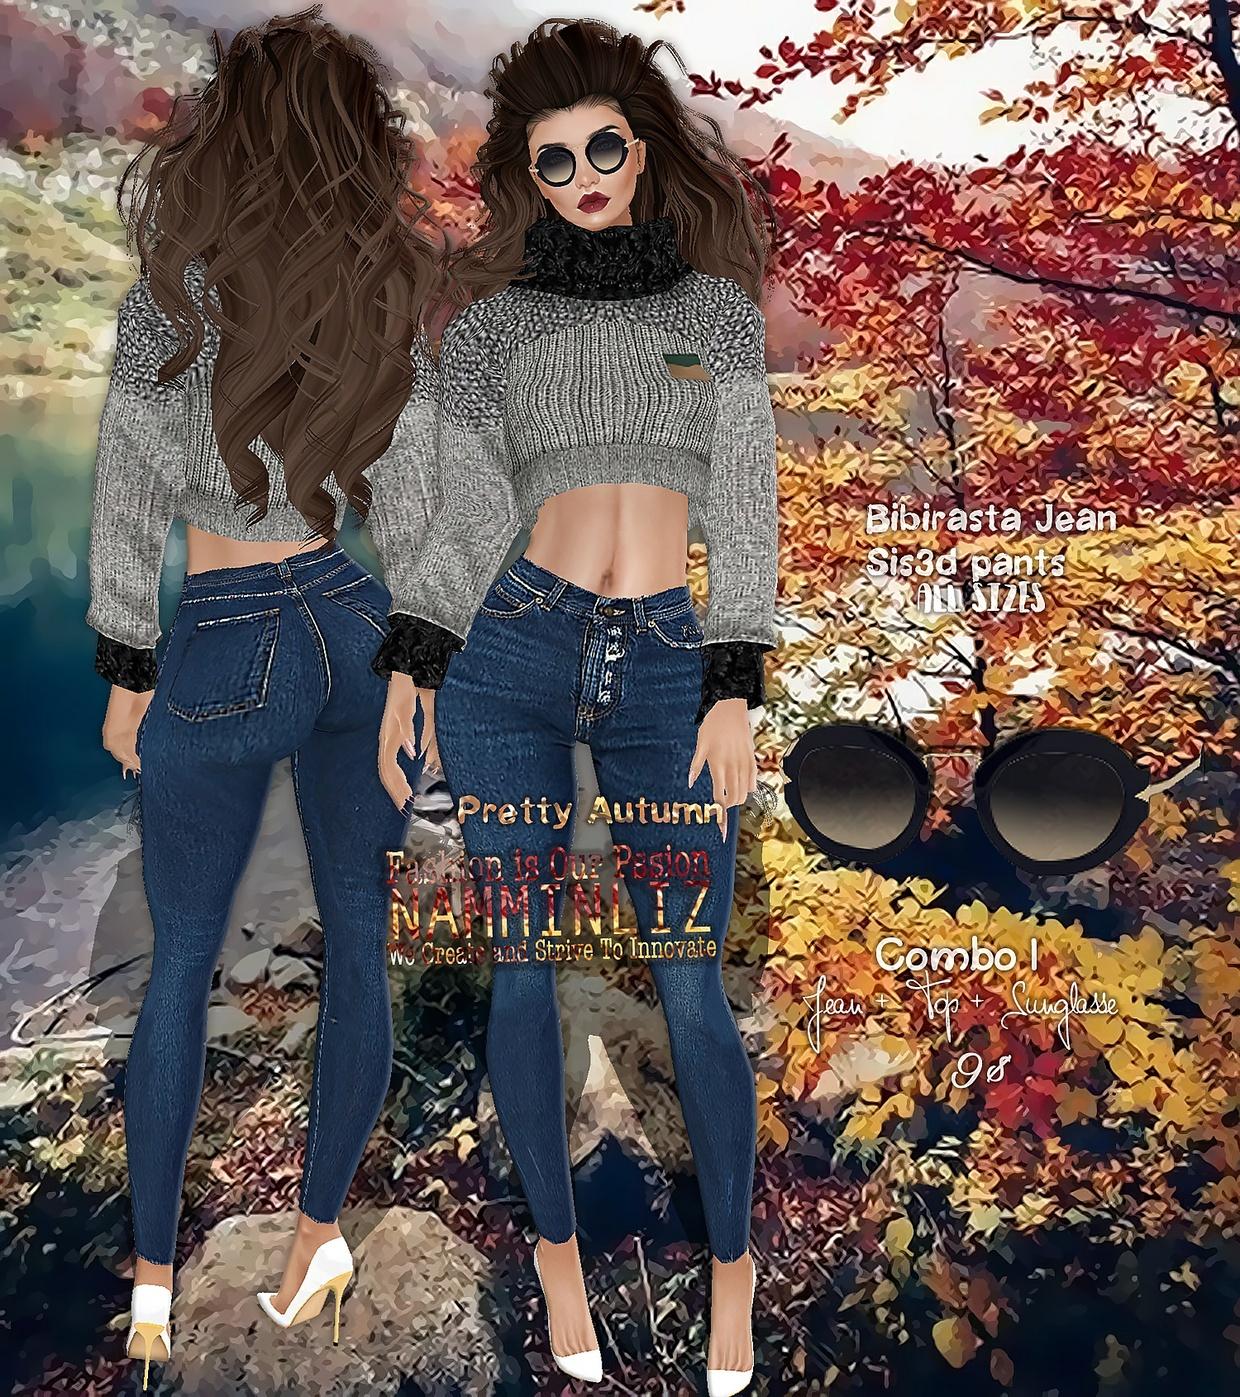 Pretty Autumn combo1 Jean Bibirasta/Sis3d + Tops +  Sunglasse